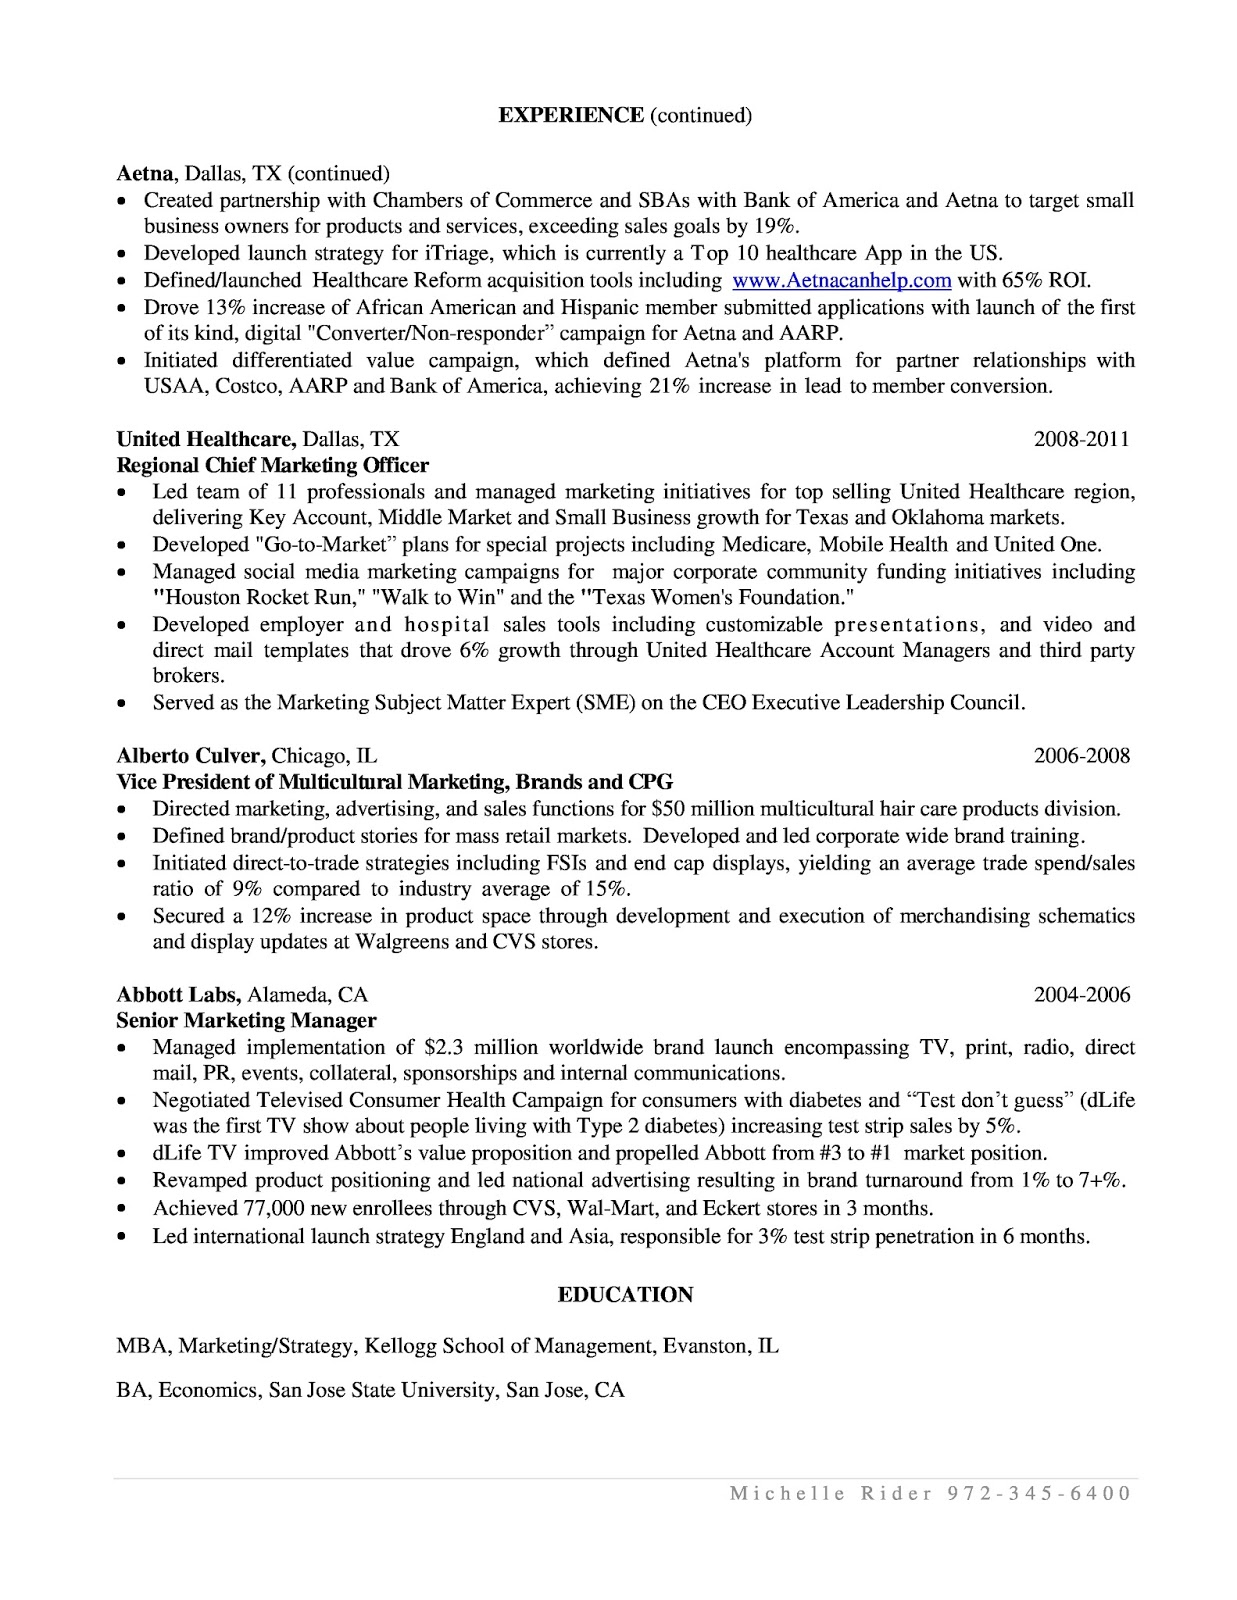 Kellogg Resume Format Latexresumebig Imposing Kellogg Resume Format ...